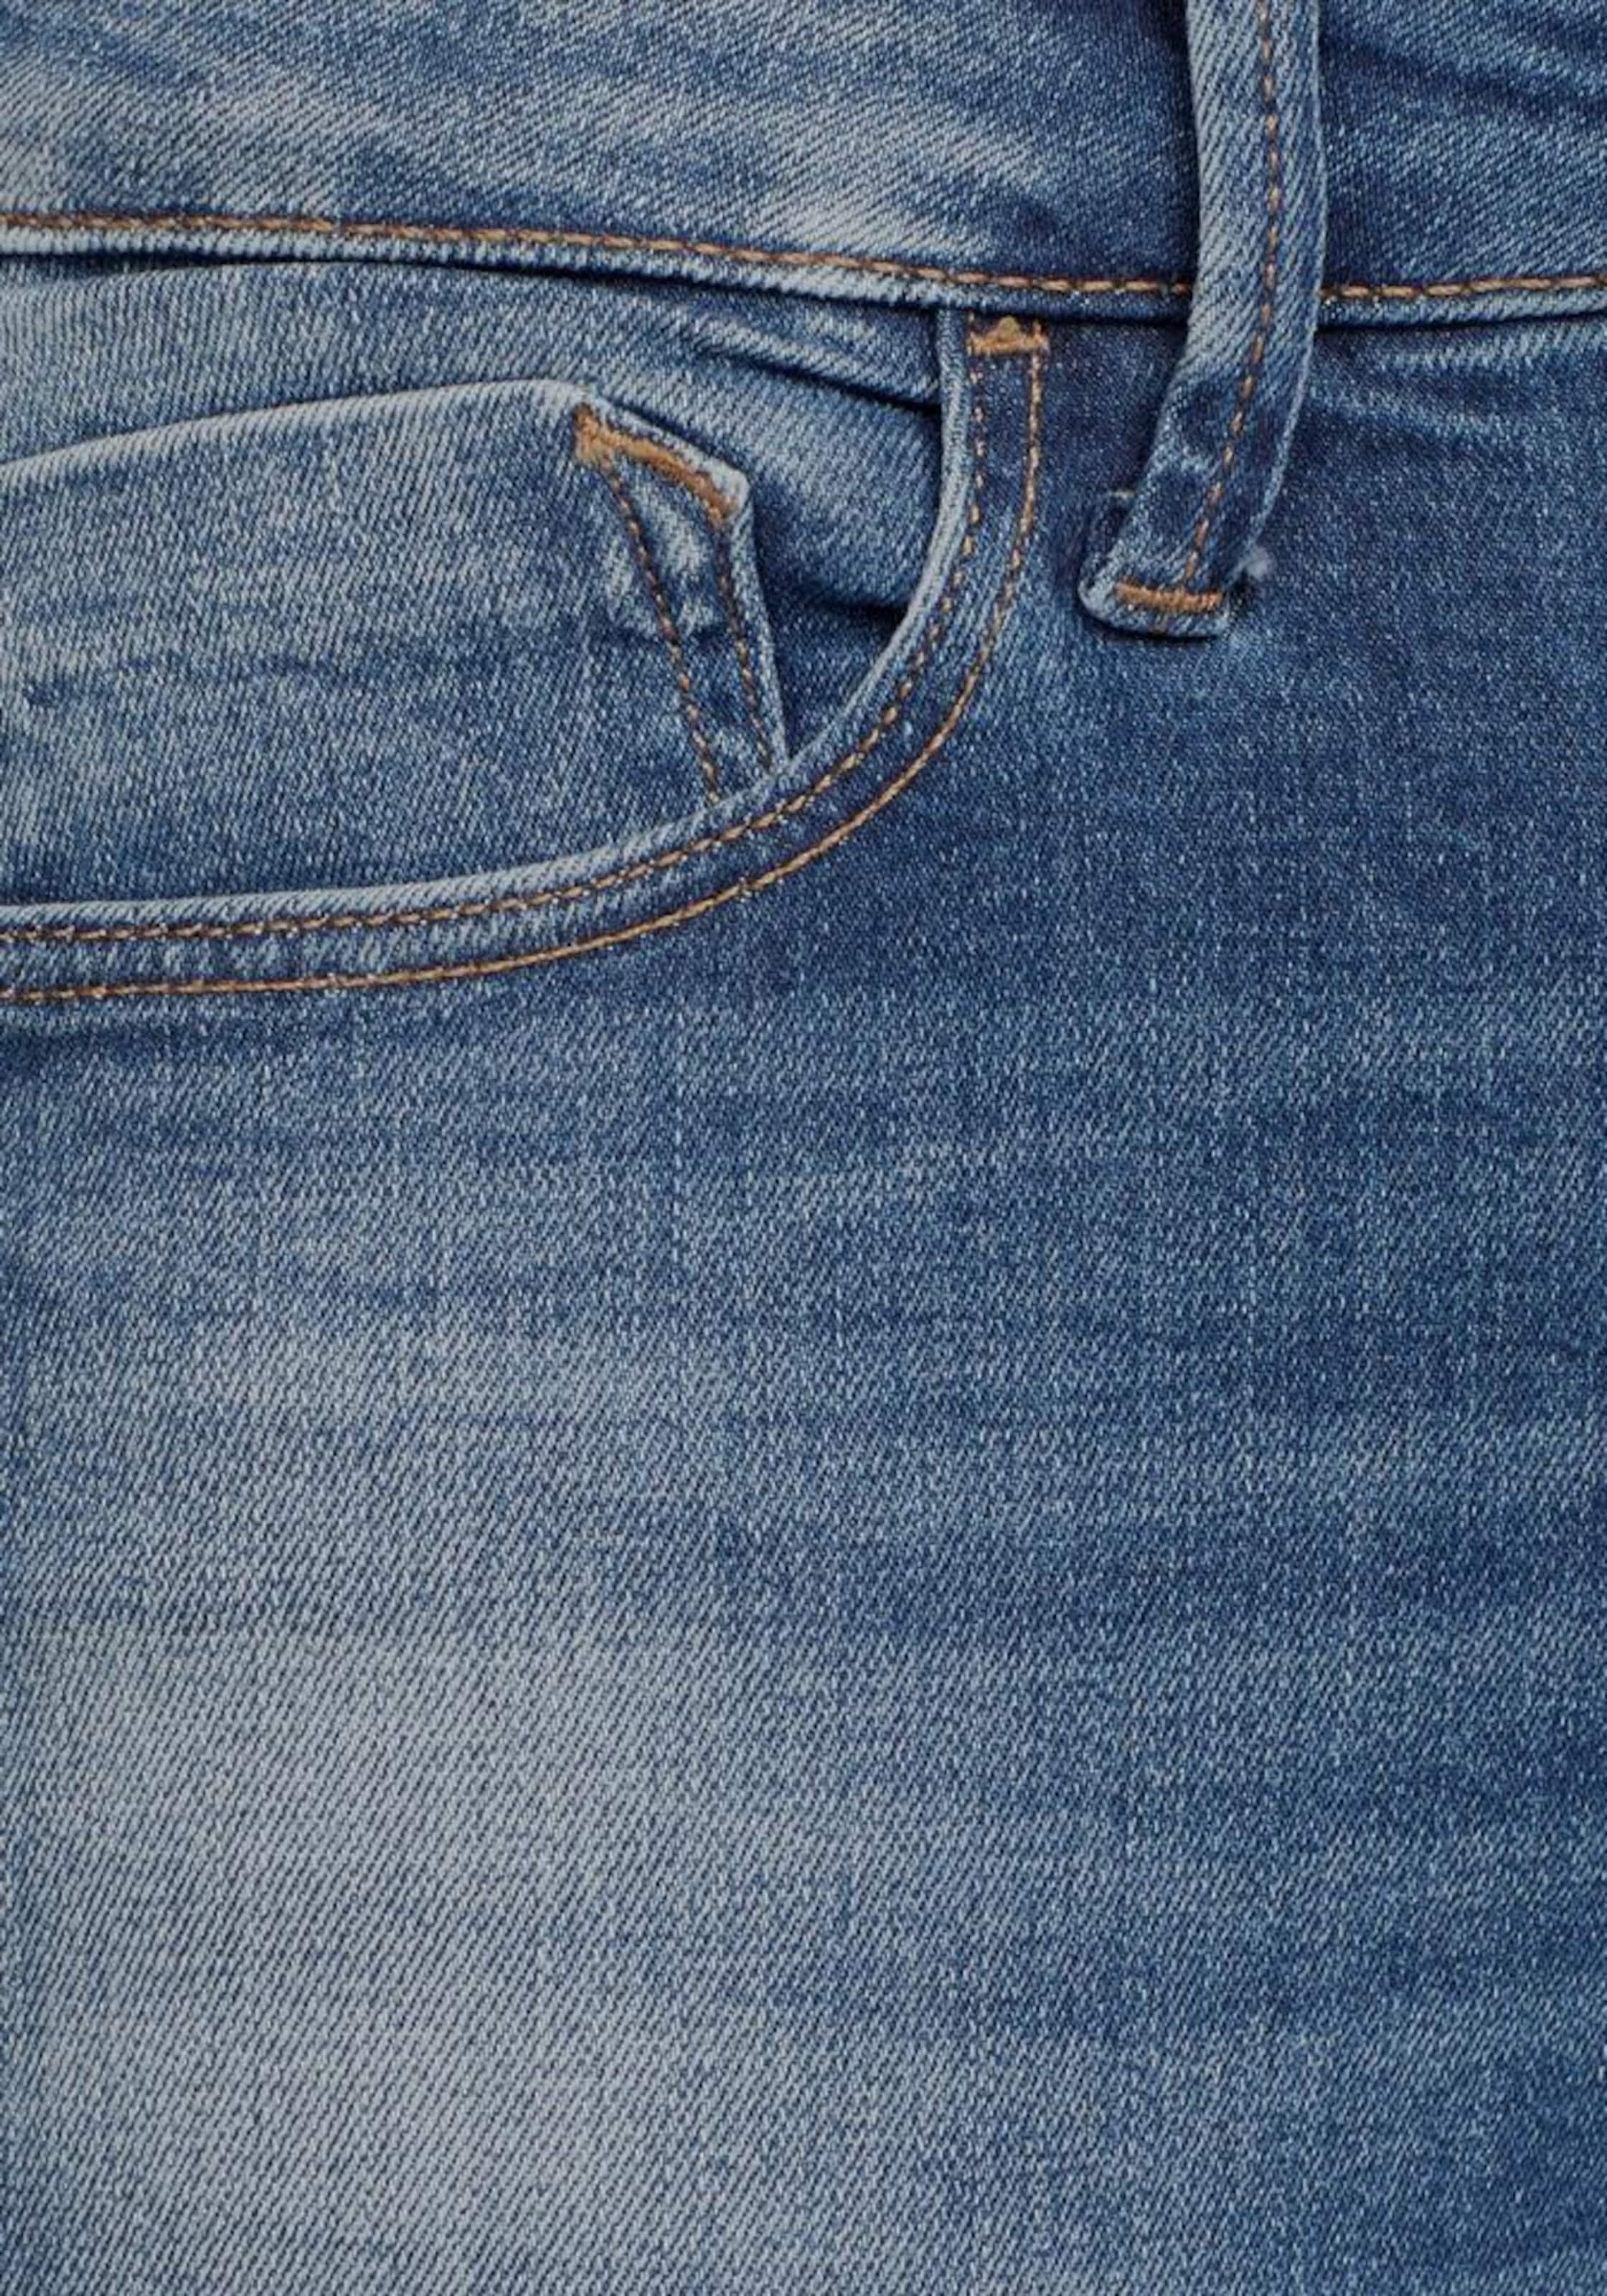 Denim Blauw Jeans 'adriana' Mavi In 9DHIE2